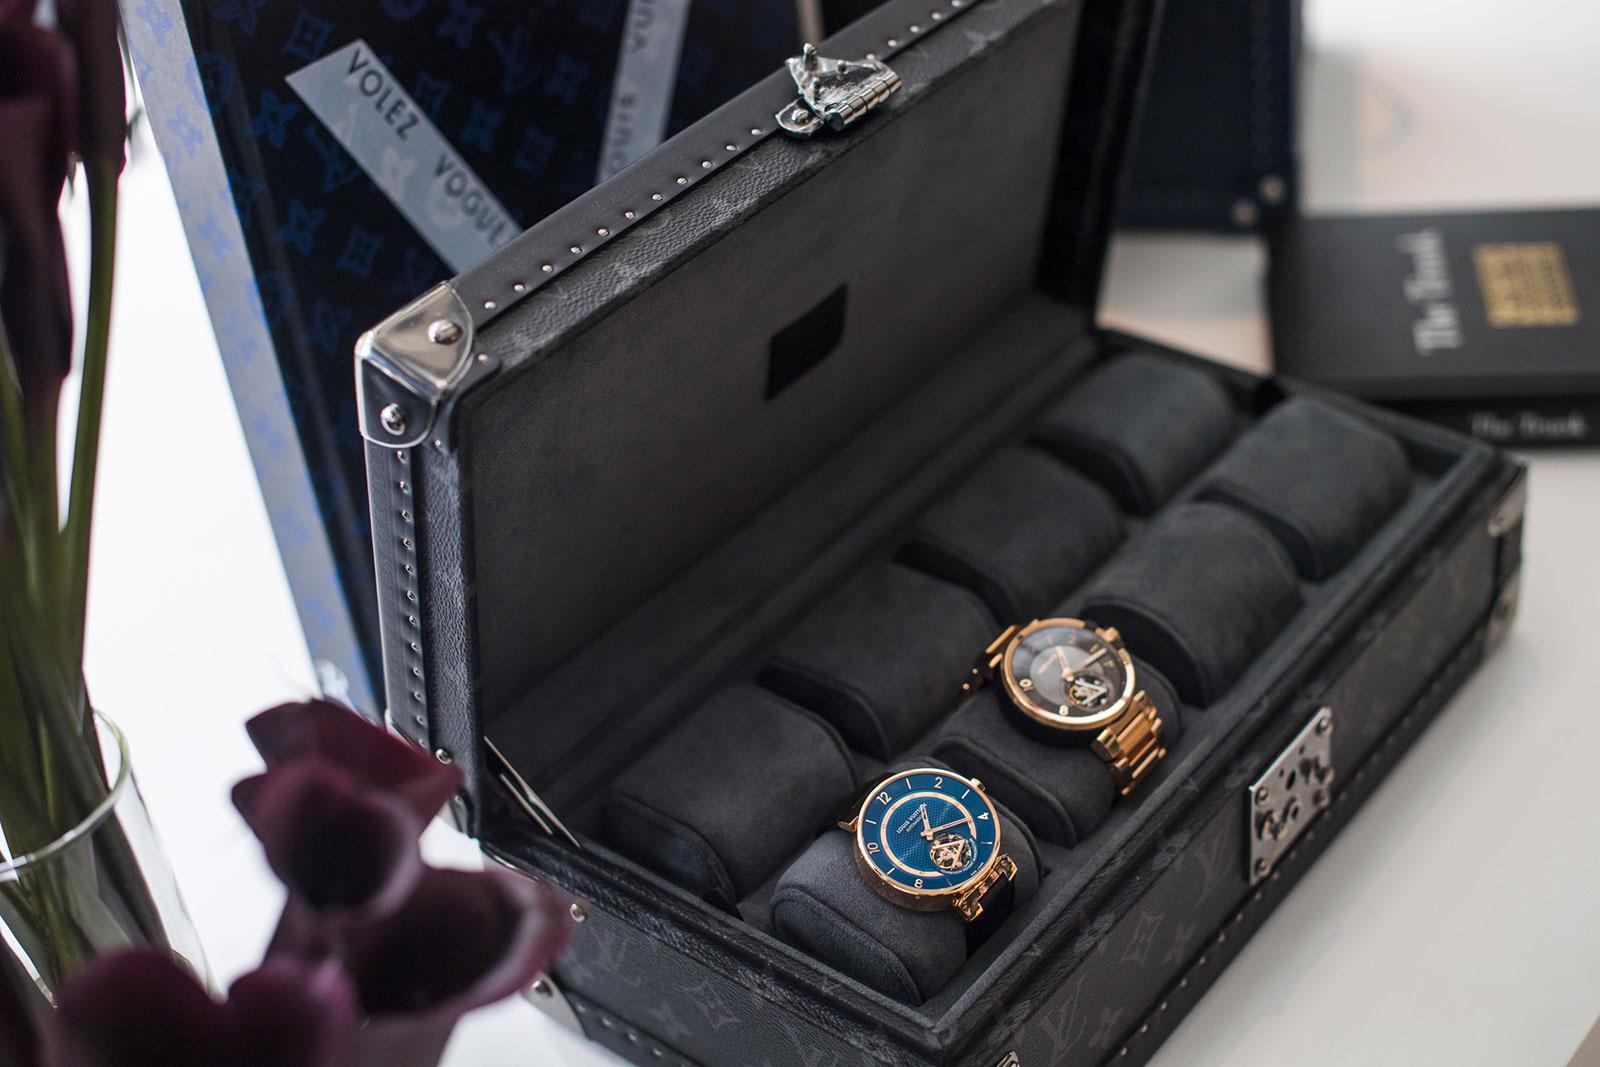 premium selection ad5ad 62973 Event Report: Louis Vuitton High Watch Presentation in Bangkok | SJX ...